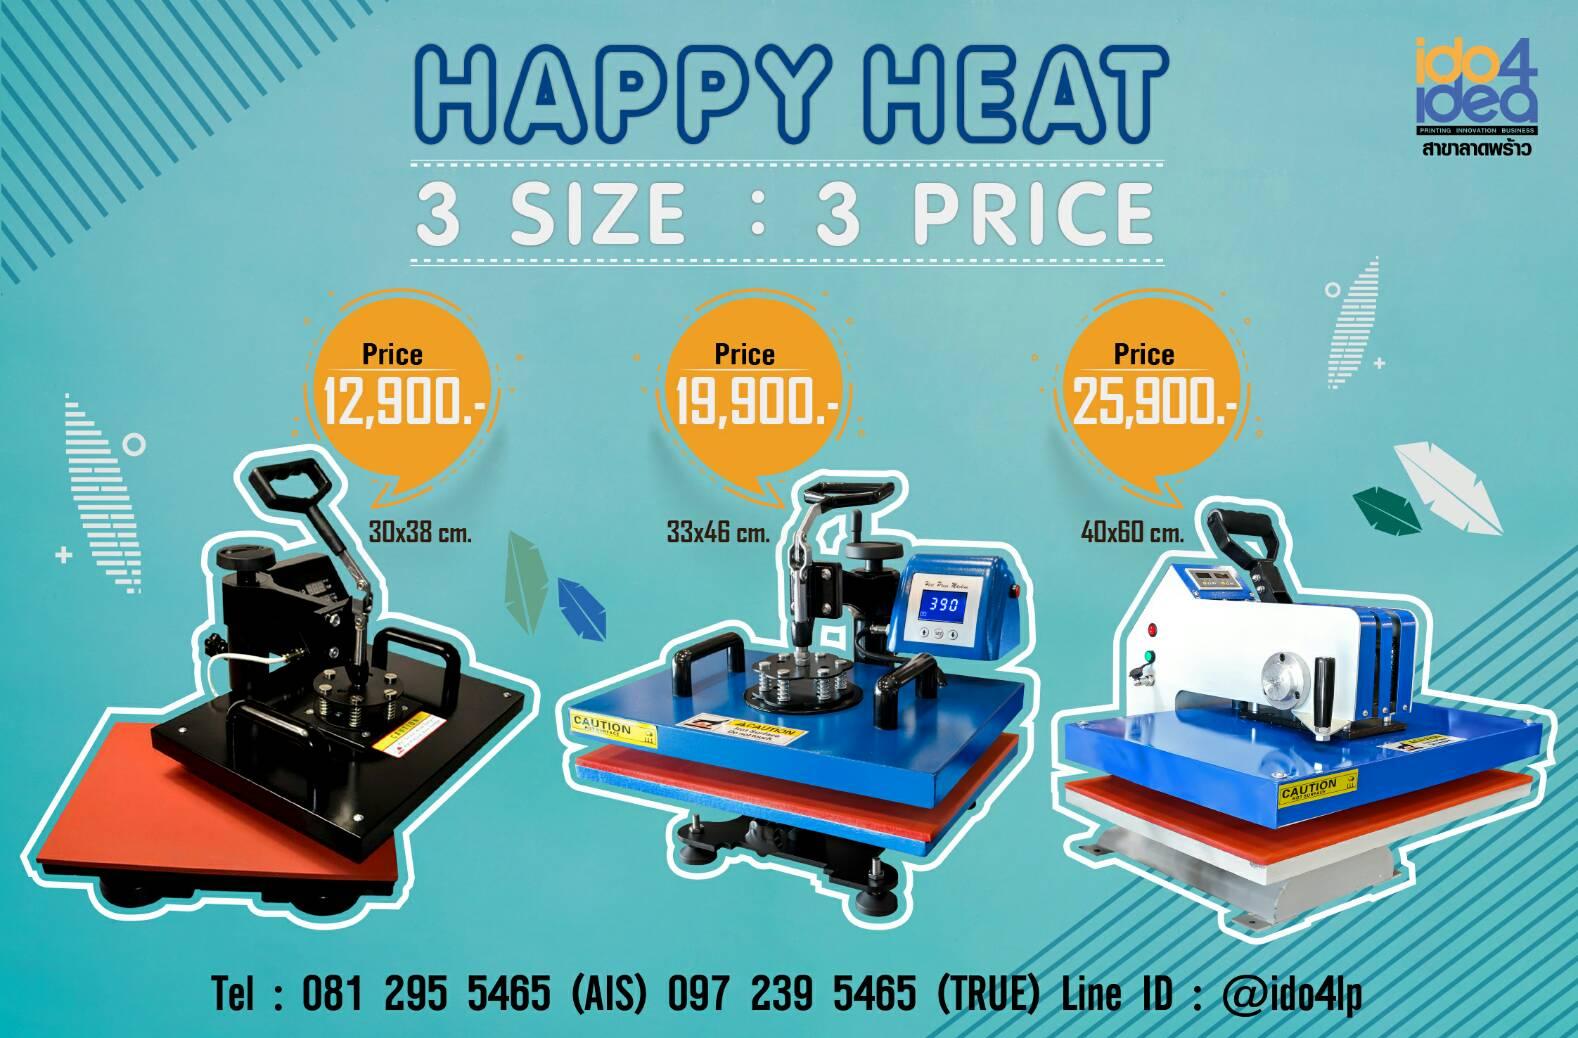 Promotion เครื่องสกรีนเสื้อยืด Happy Heat 3 Size : 3 Price